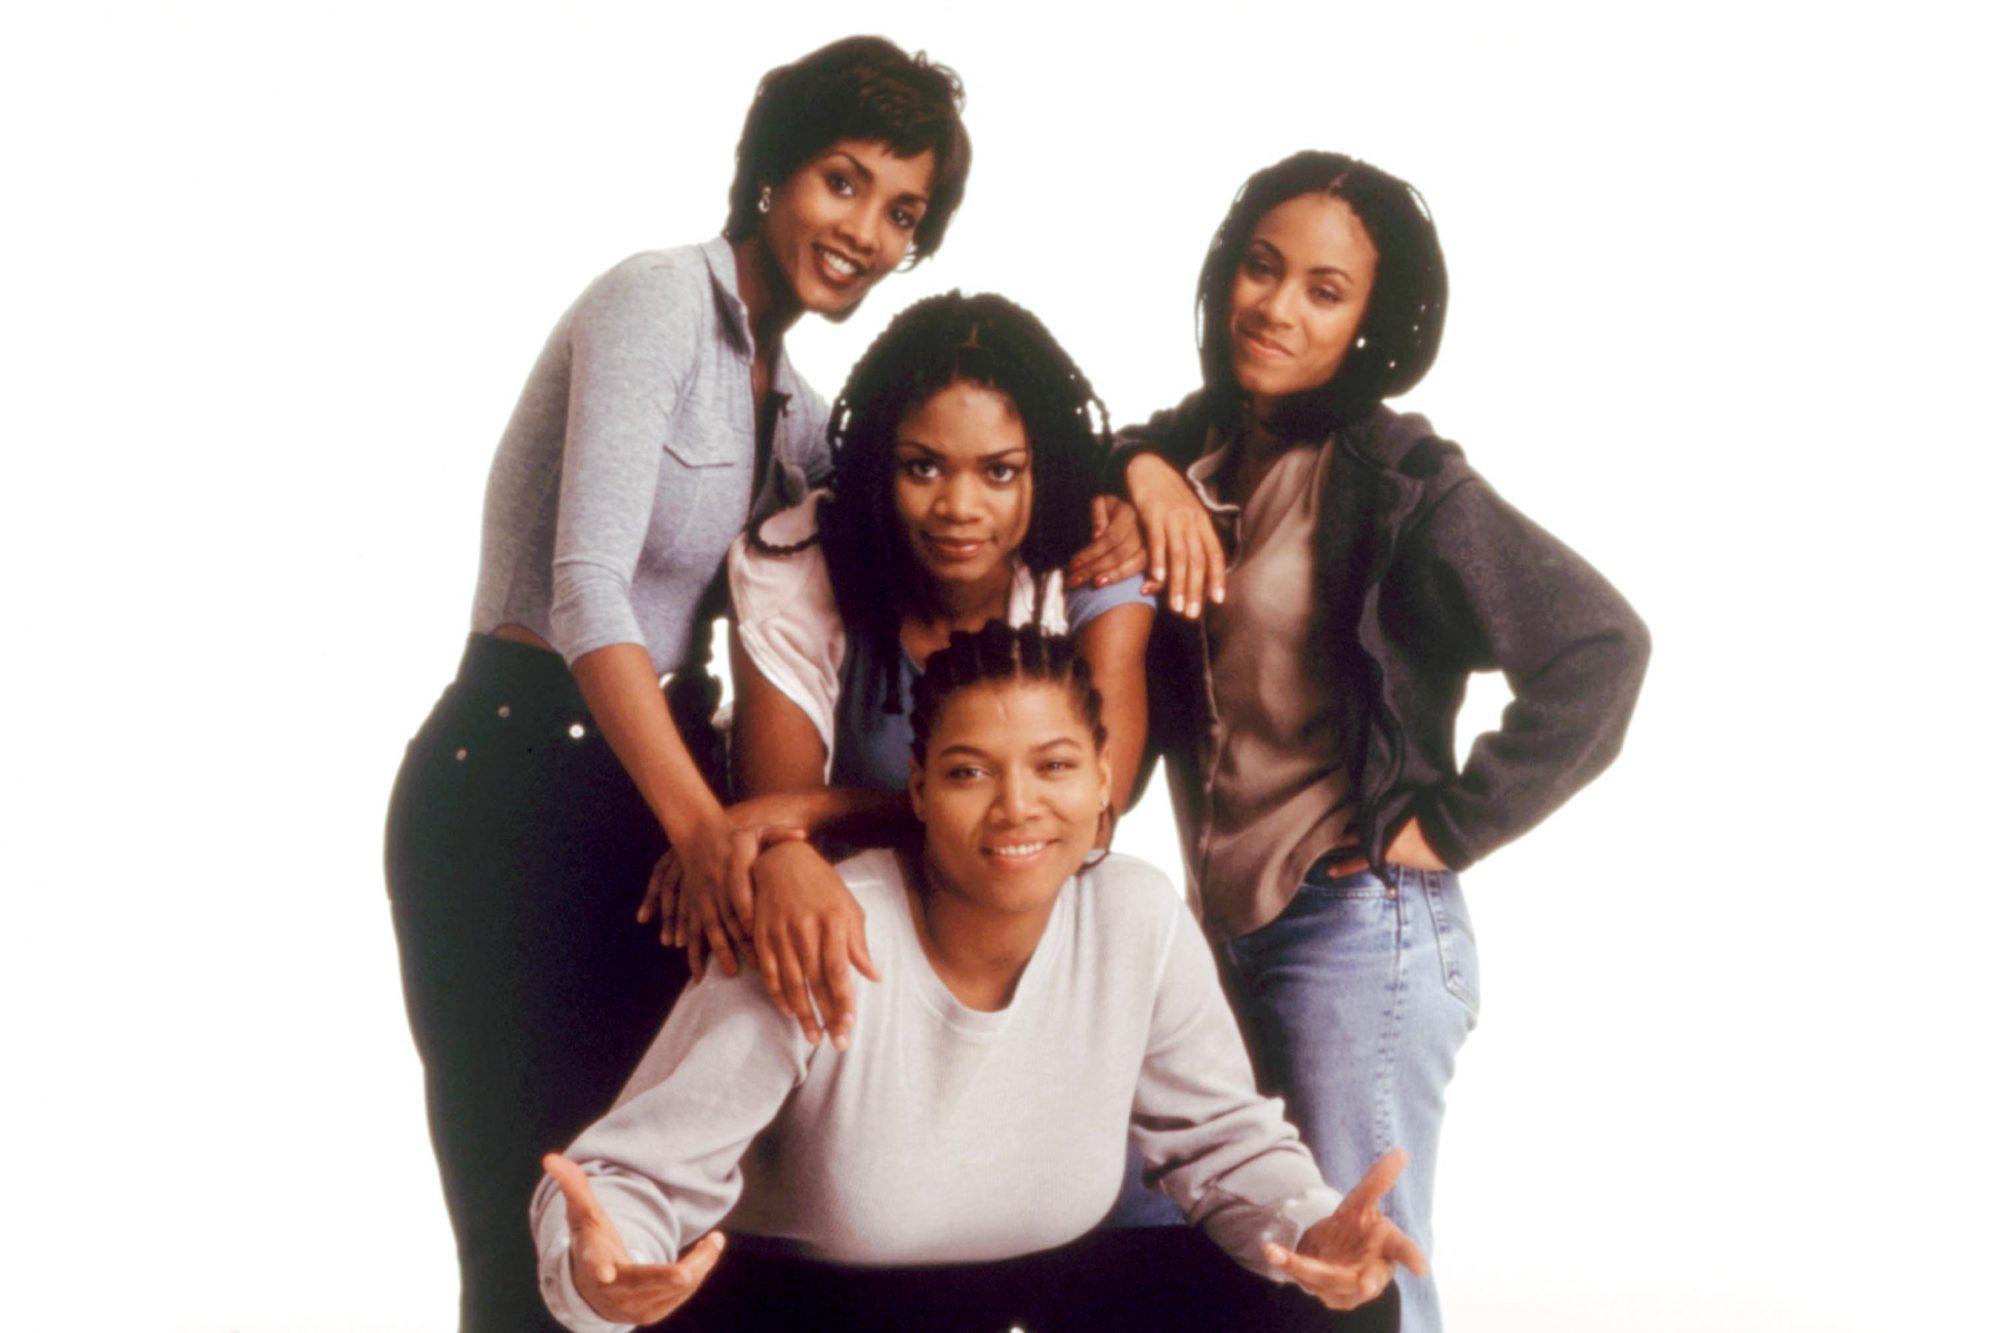 SET IT OFF, back row: Vivica A. Fox, Kimberly Elise, Jada Pinkett, front: Queen Latifah, 1996. (c)New Line Cinema/courtesy Everett Collection